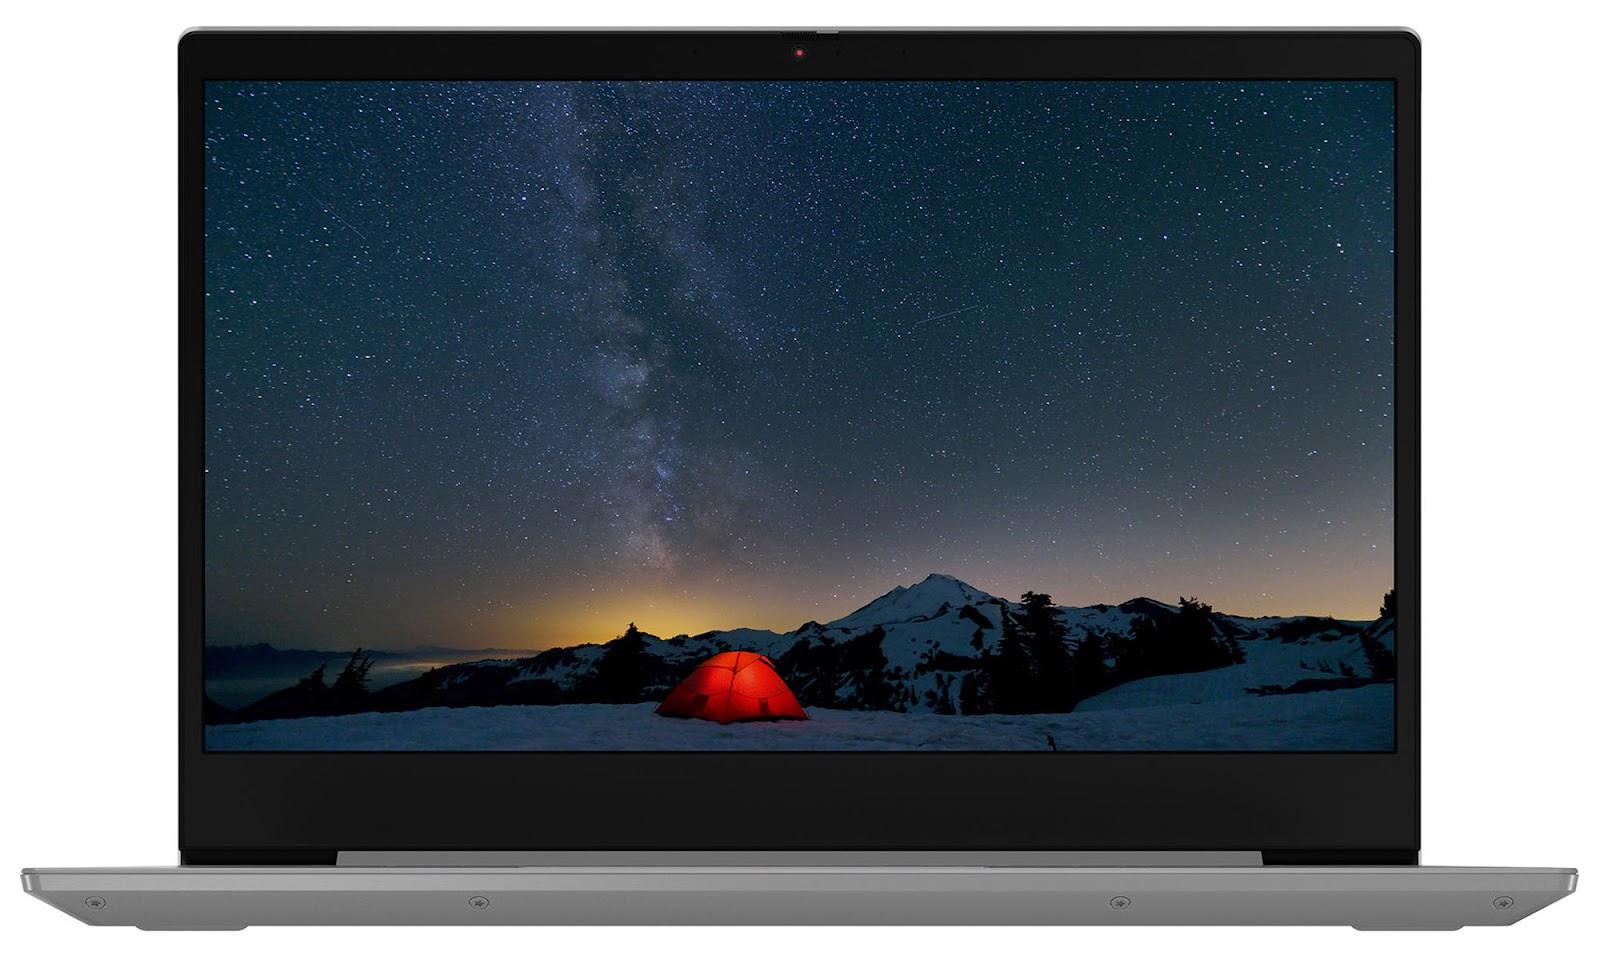 Фото 1. Ноутбук Lenovo ThinkBook 14 IIL (20SL00F6RU)